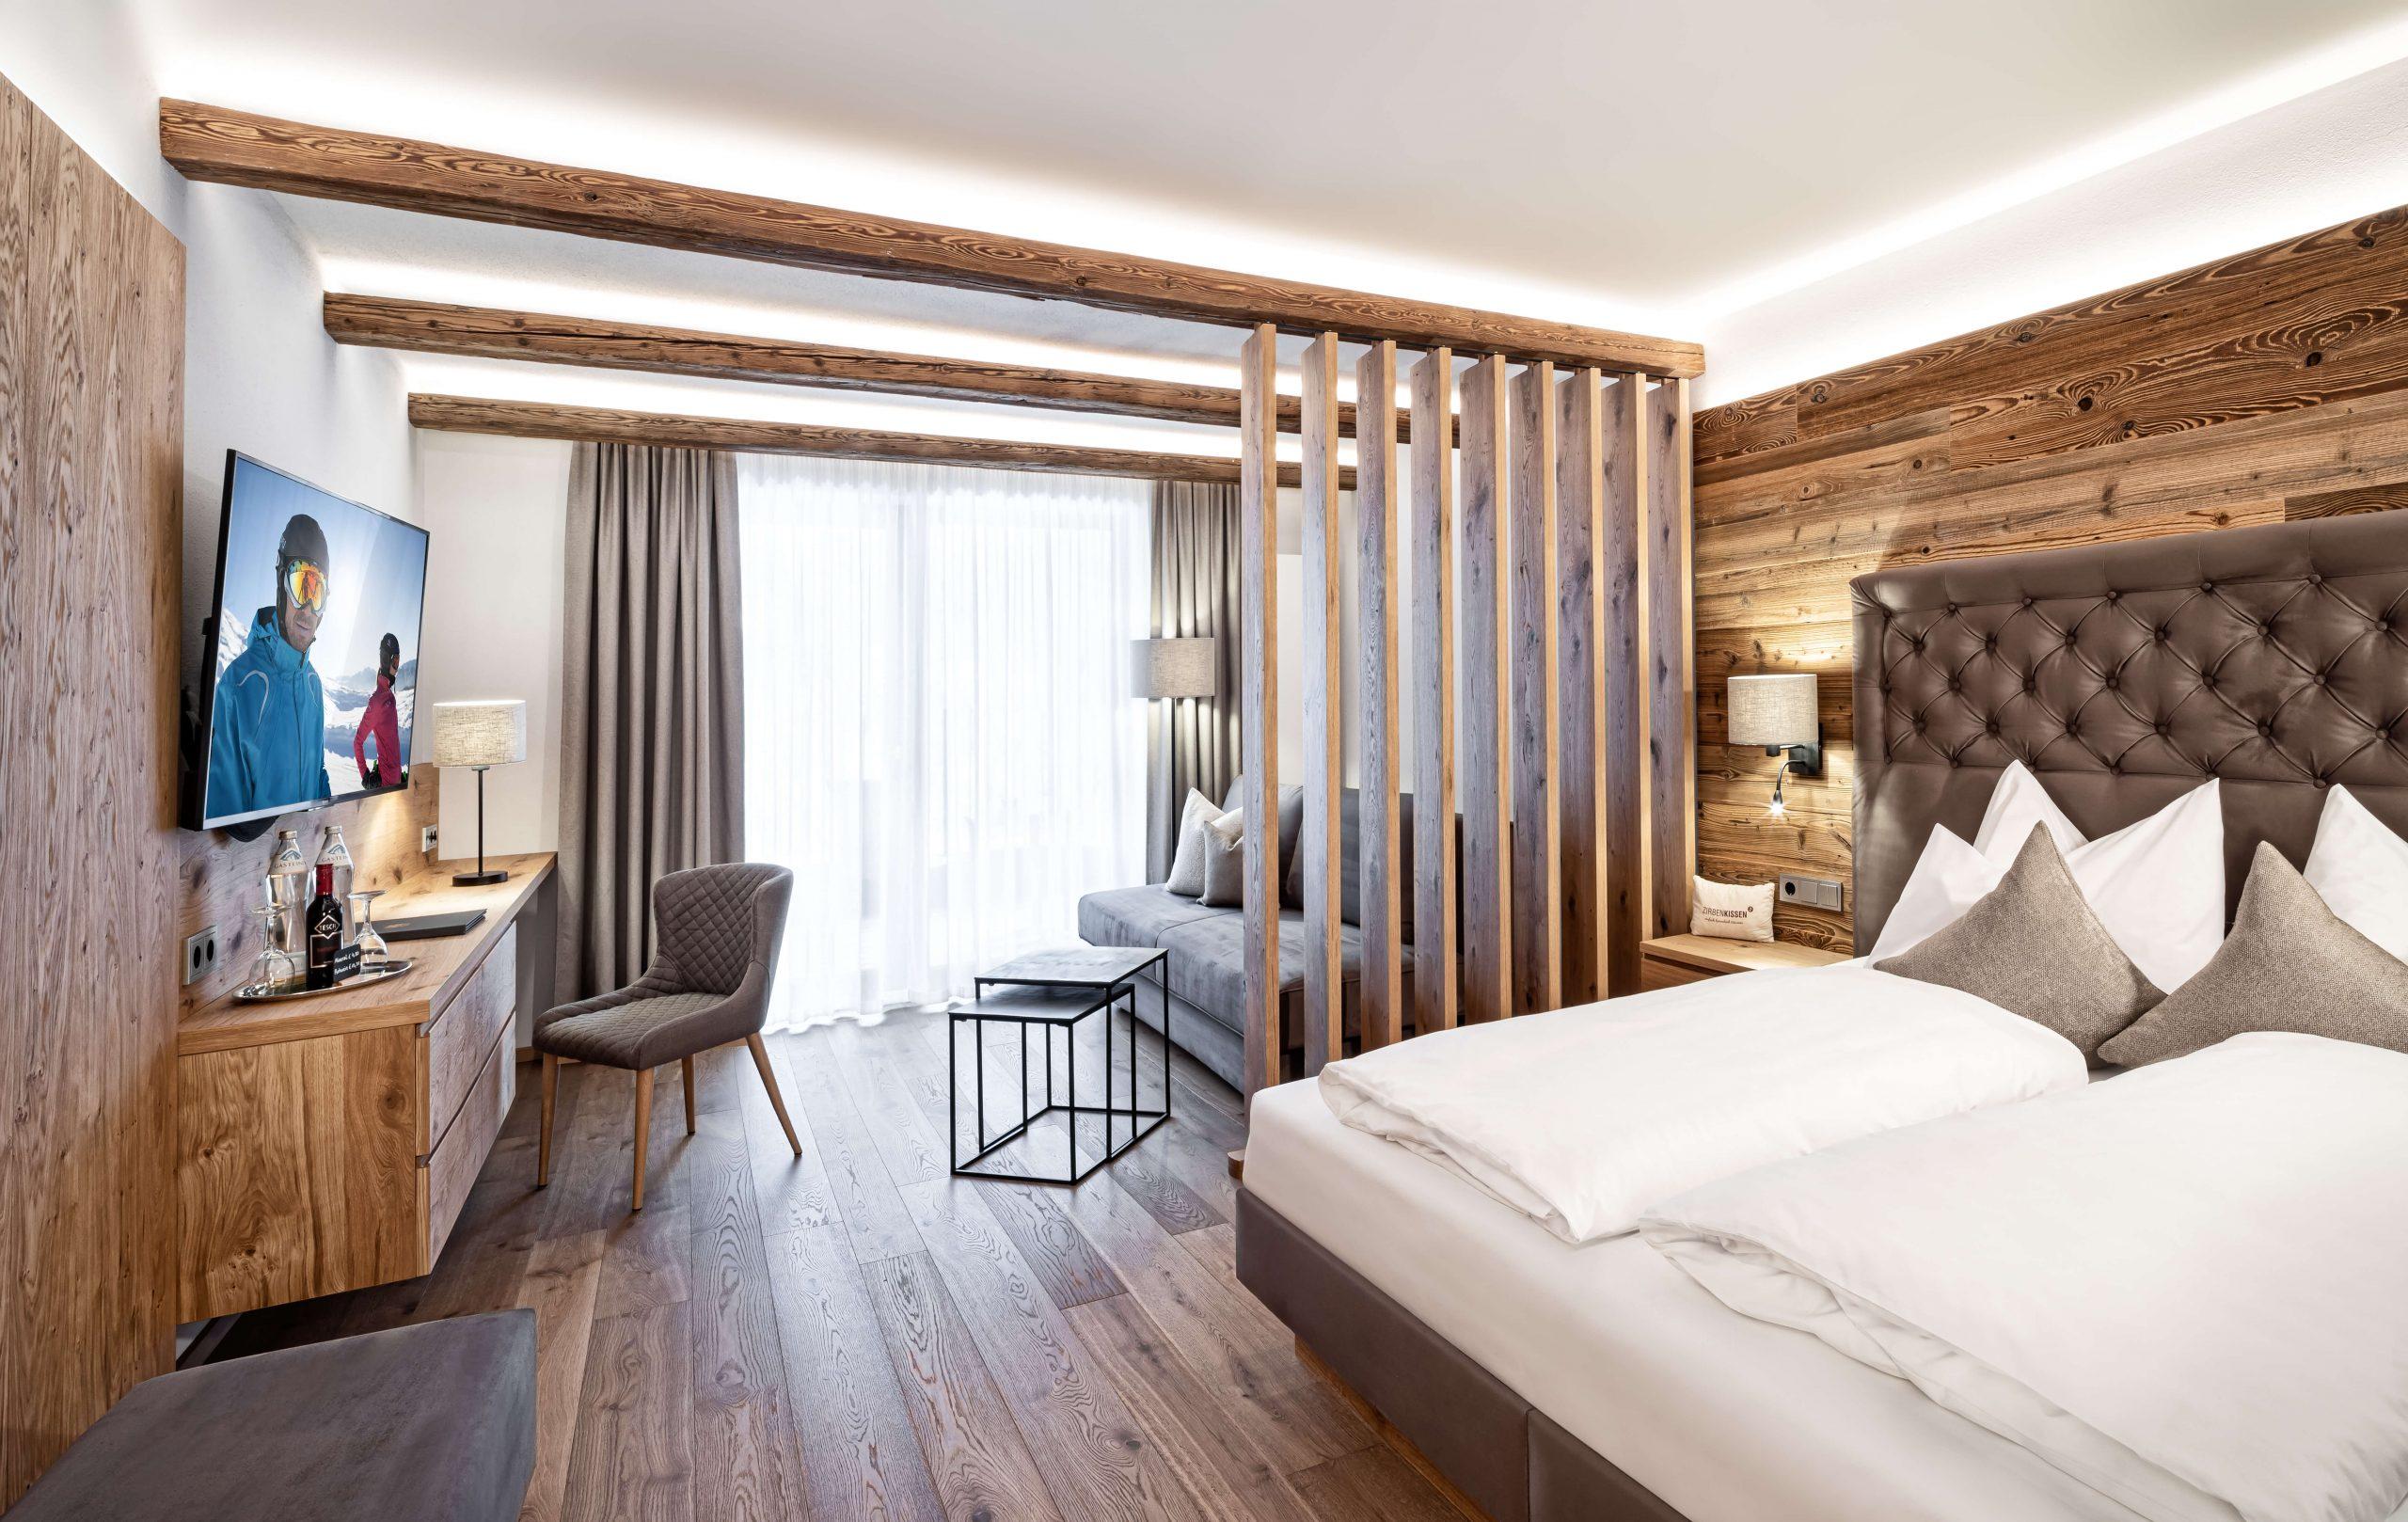 Juniorsuite Bergquell im Naturidyll Hotel Edelweiss Wagrain